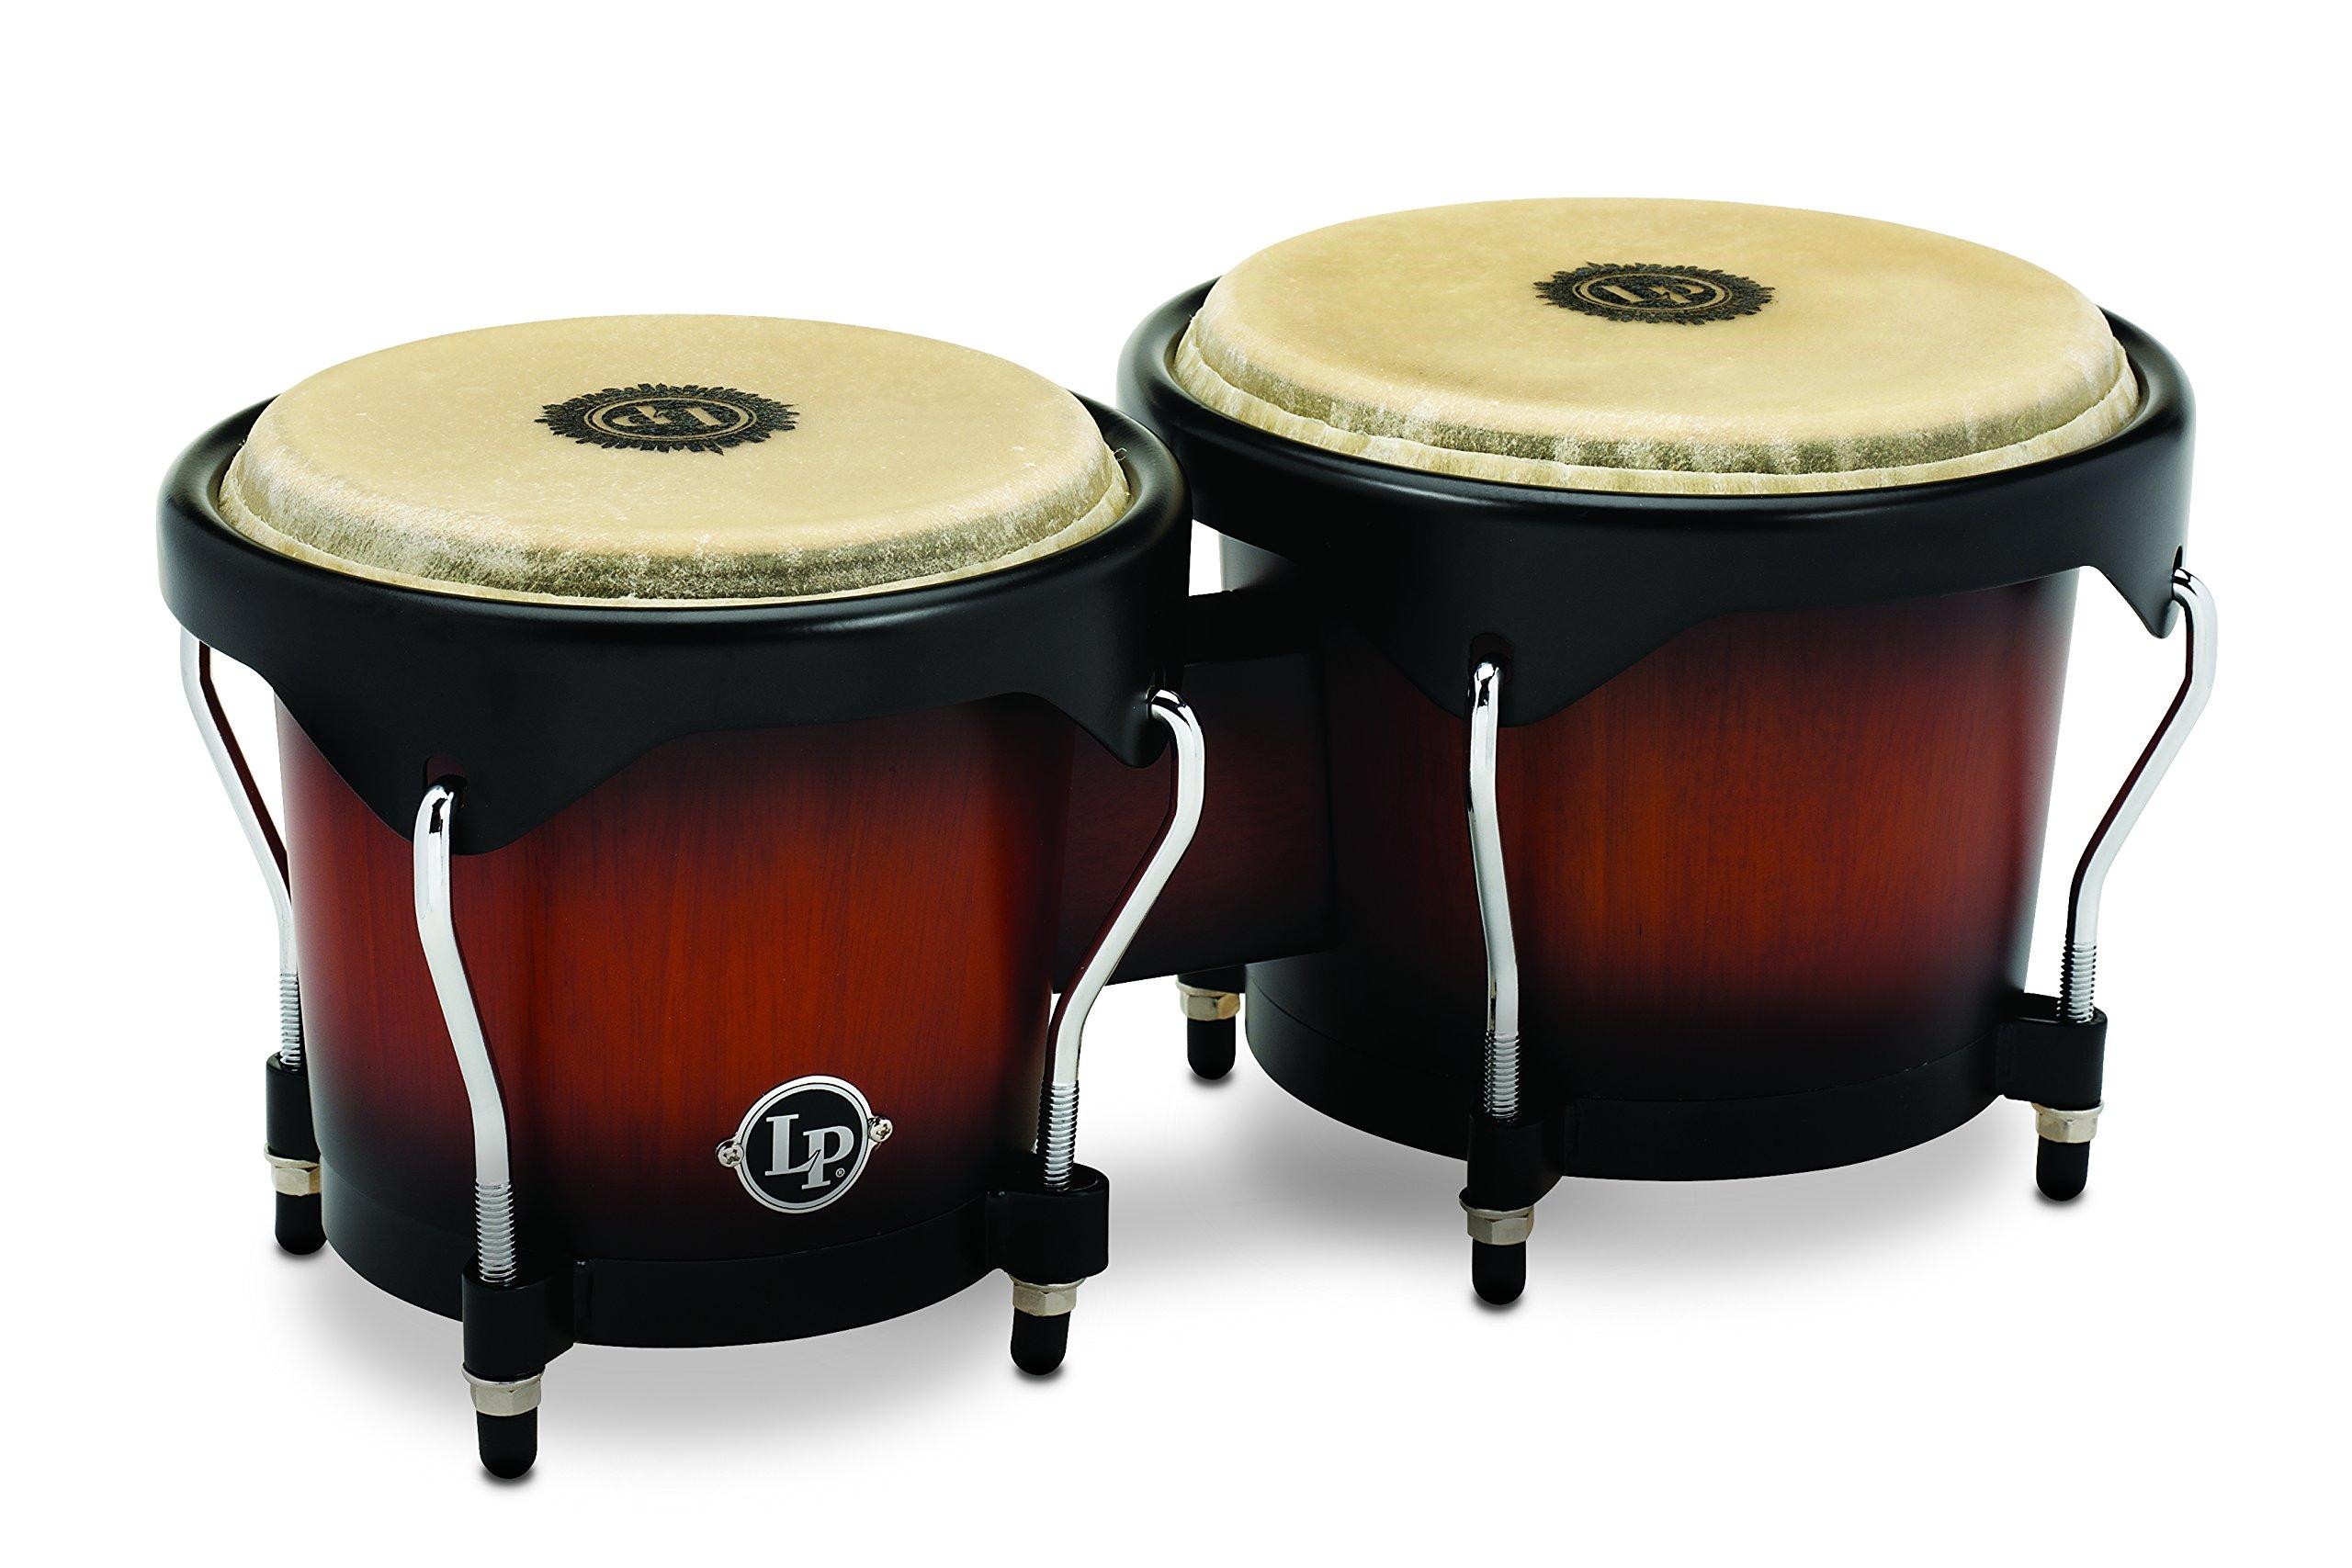 Latin Percussion LP601NY-VSB LP City Wood Bongos - Vintage Sunburst by Latin Percussion